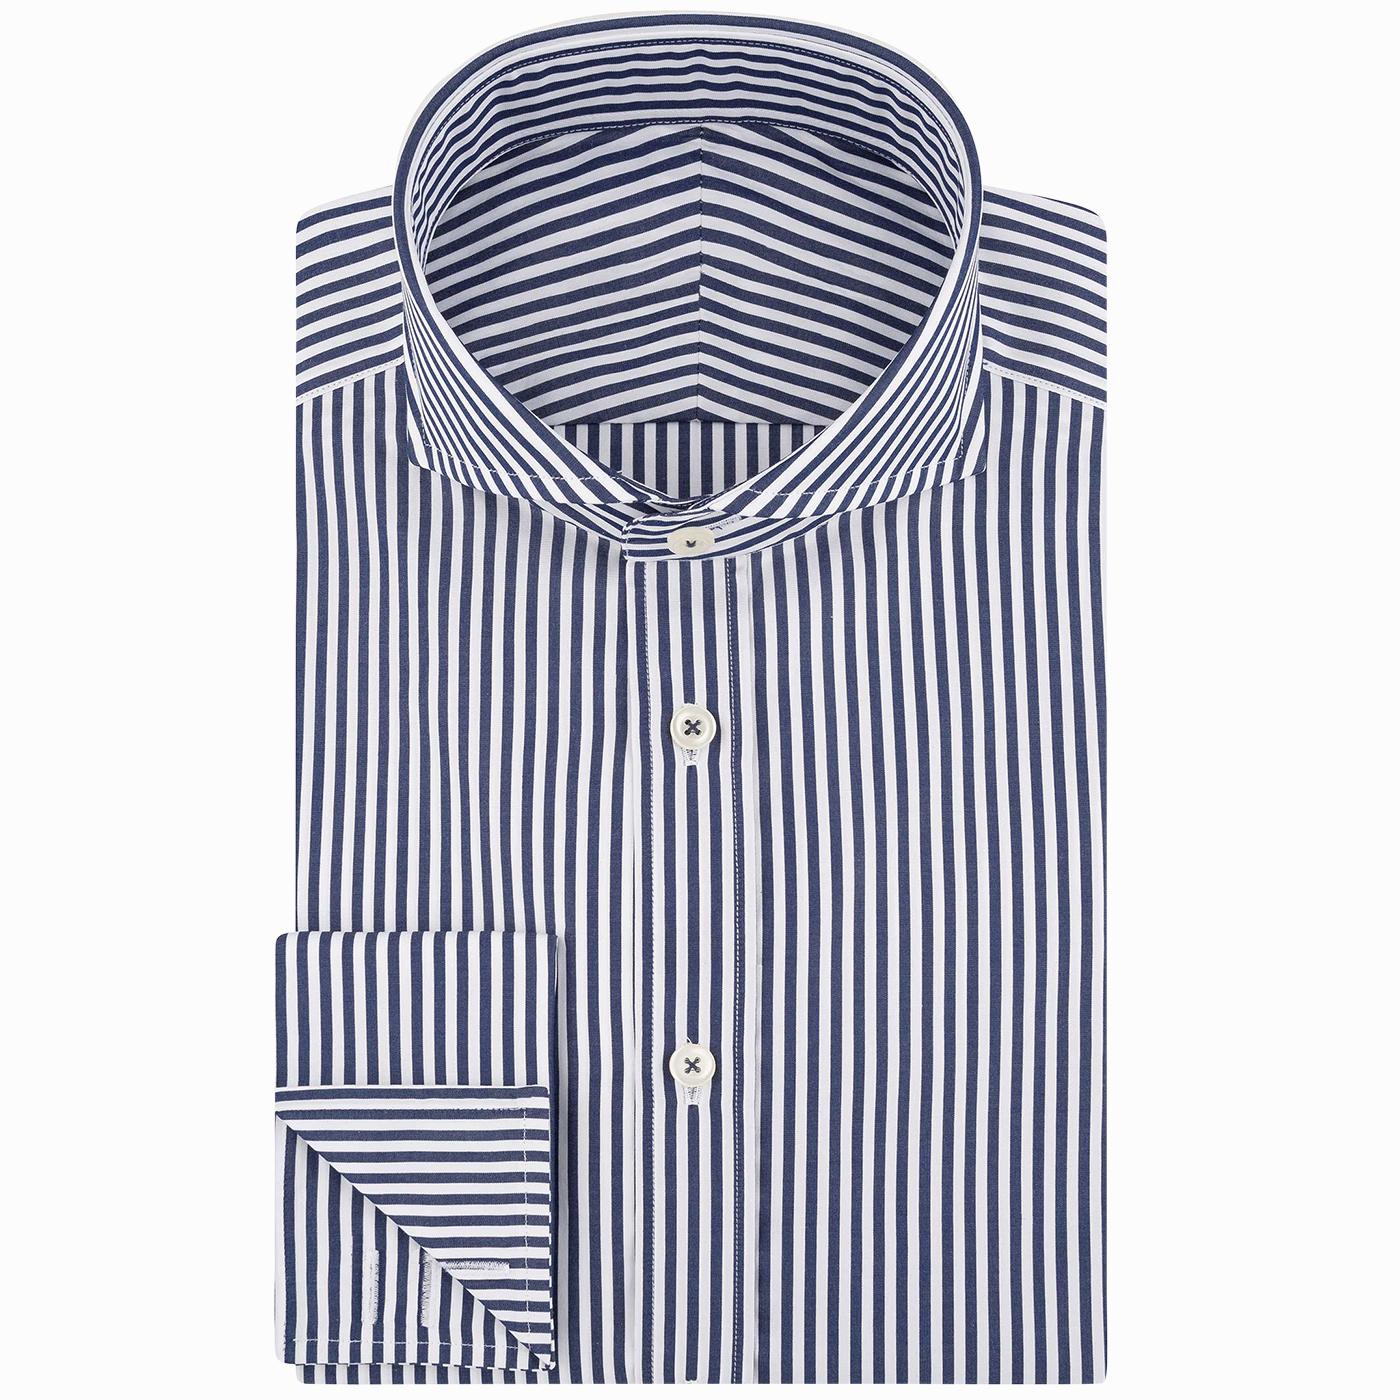 Shirt_1_Begal-stripe_navy.jpg